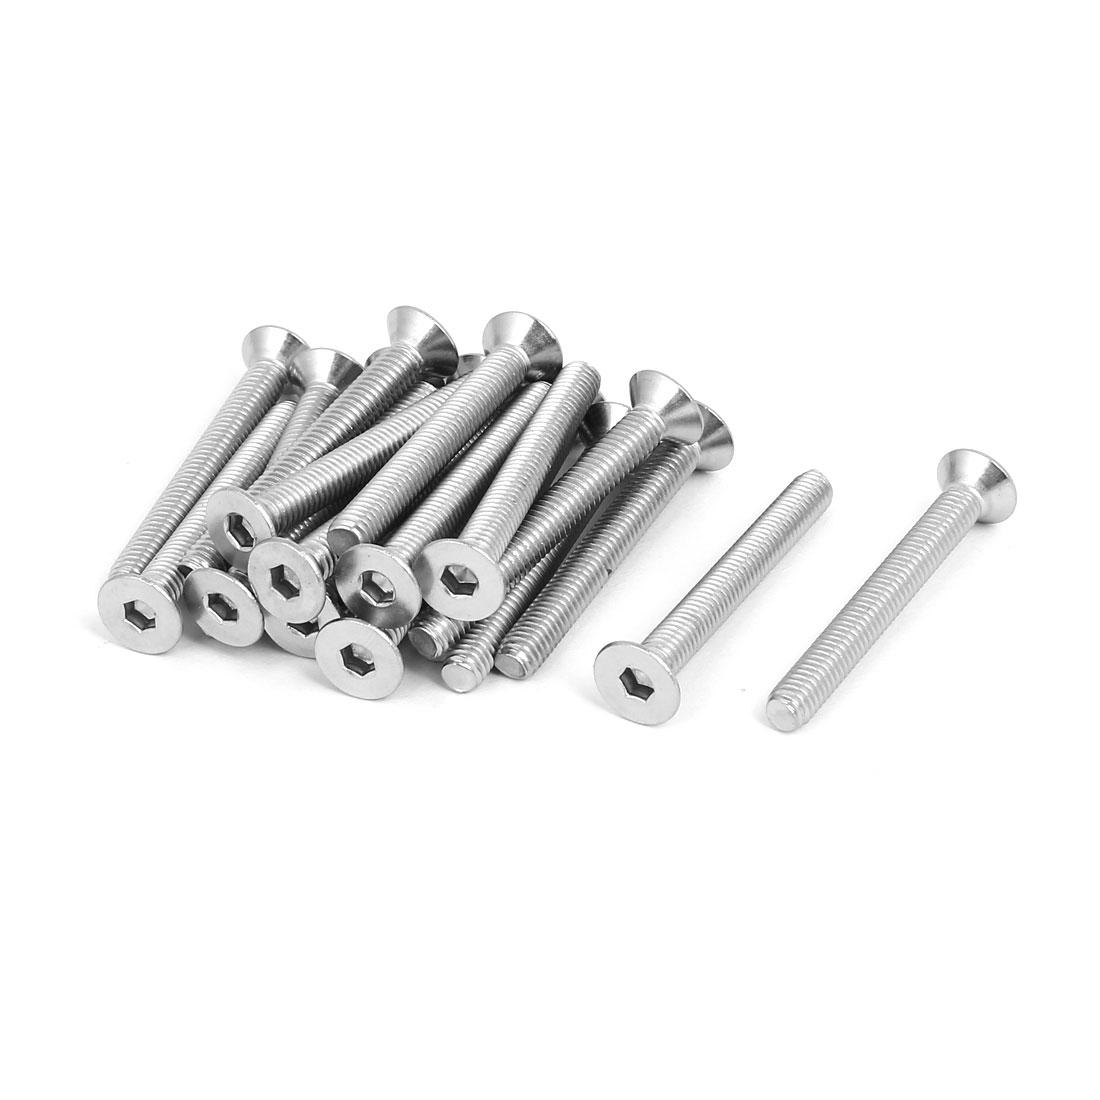 M6x50mm 304 Stainless Steel Countersunk Flat Head Hex Socket Screws DIN7991 20pcs